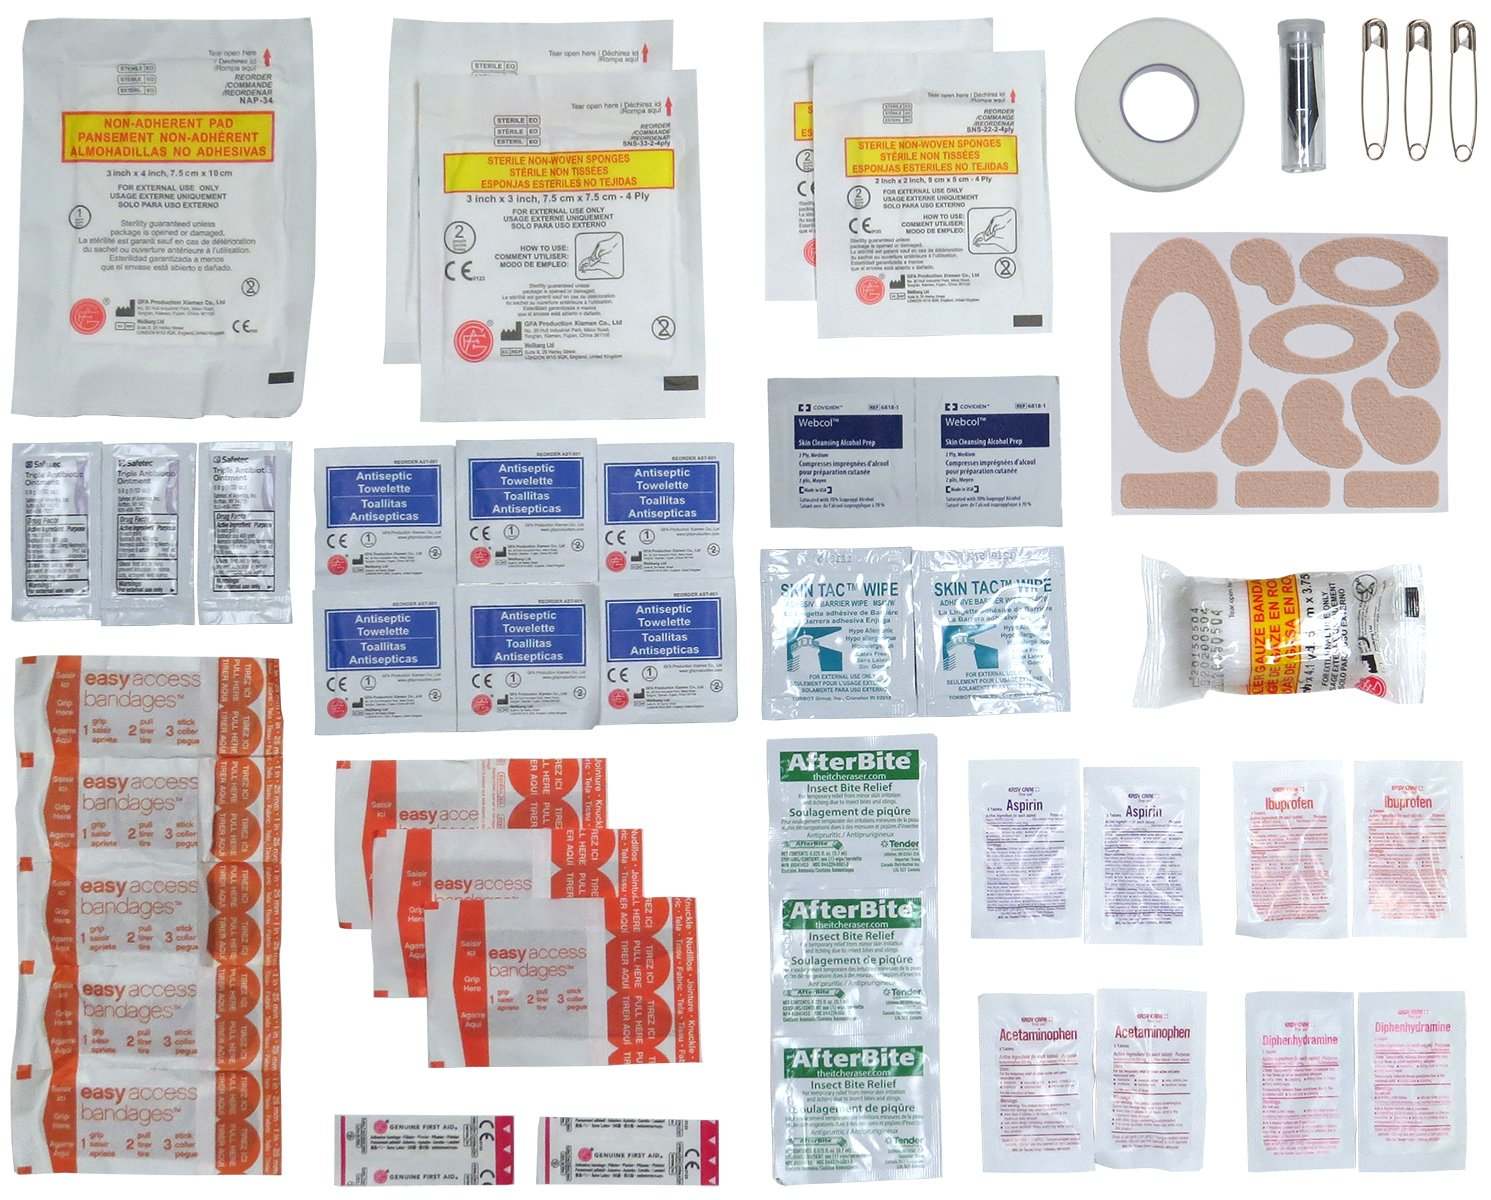 Ultralight & Watertight .5 Medical Kit